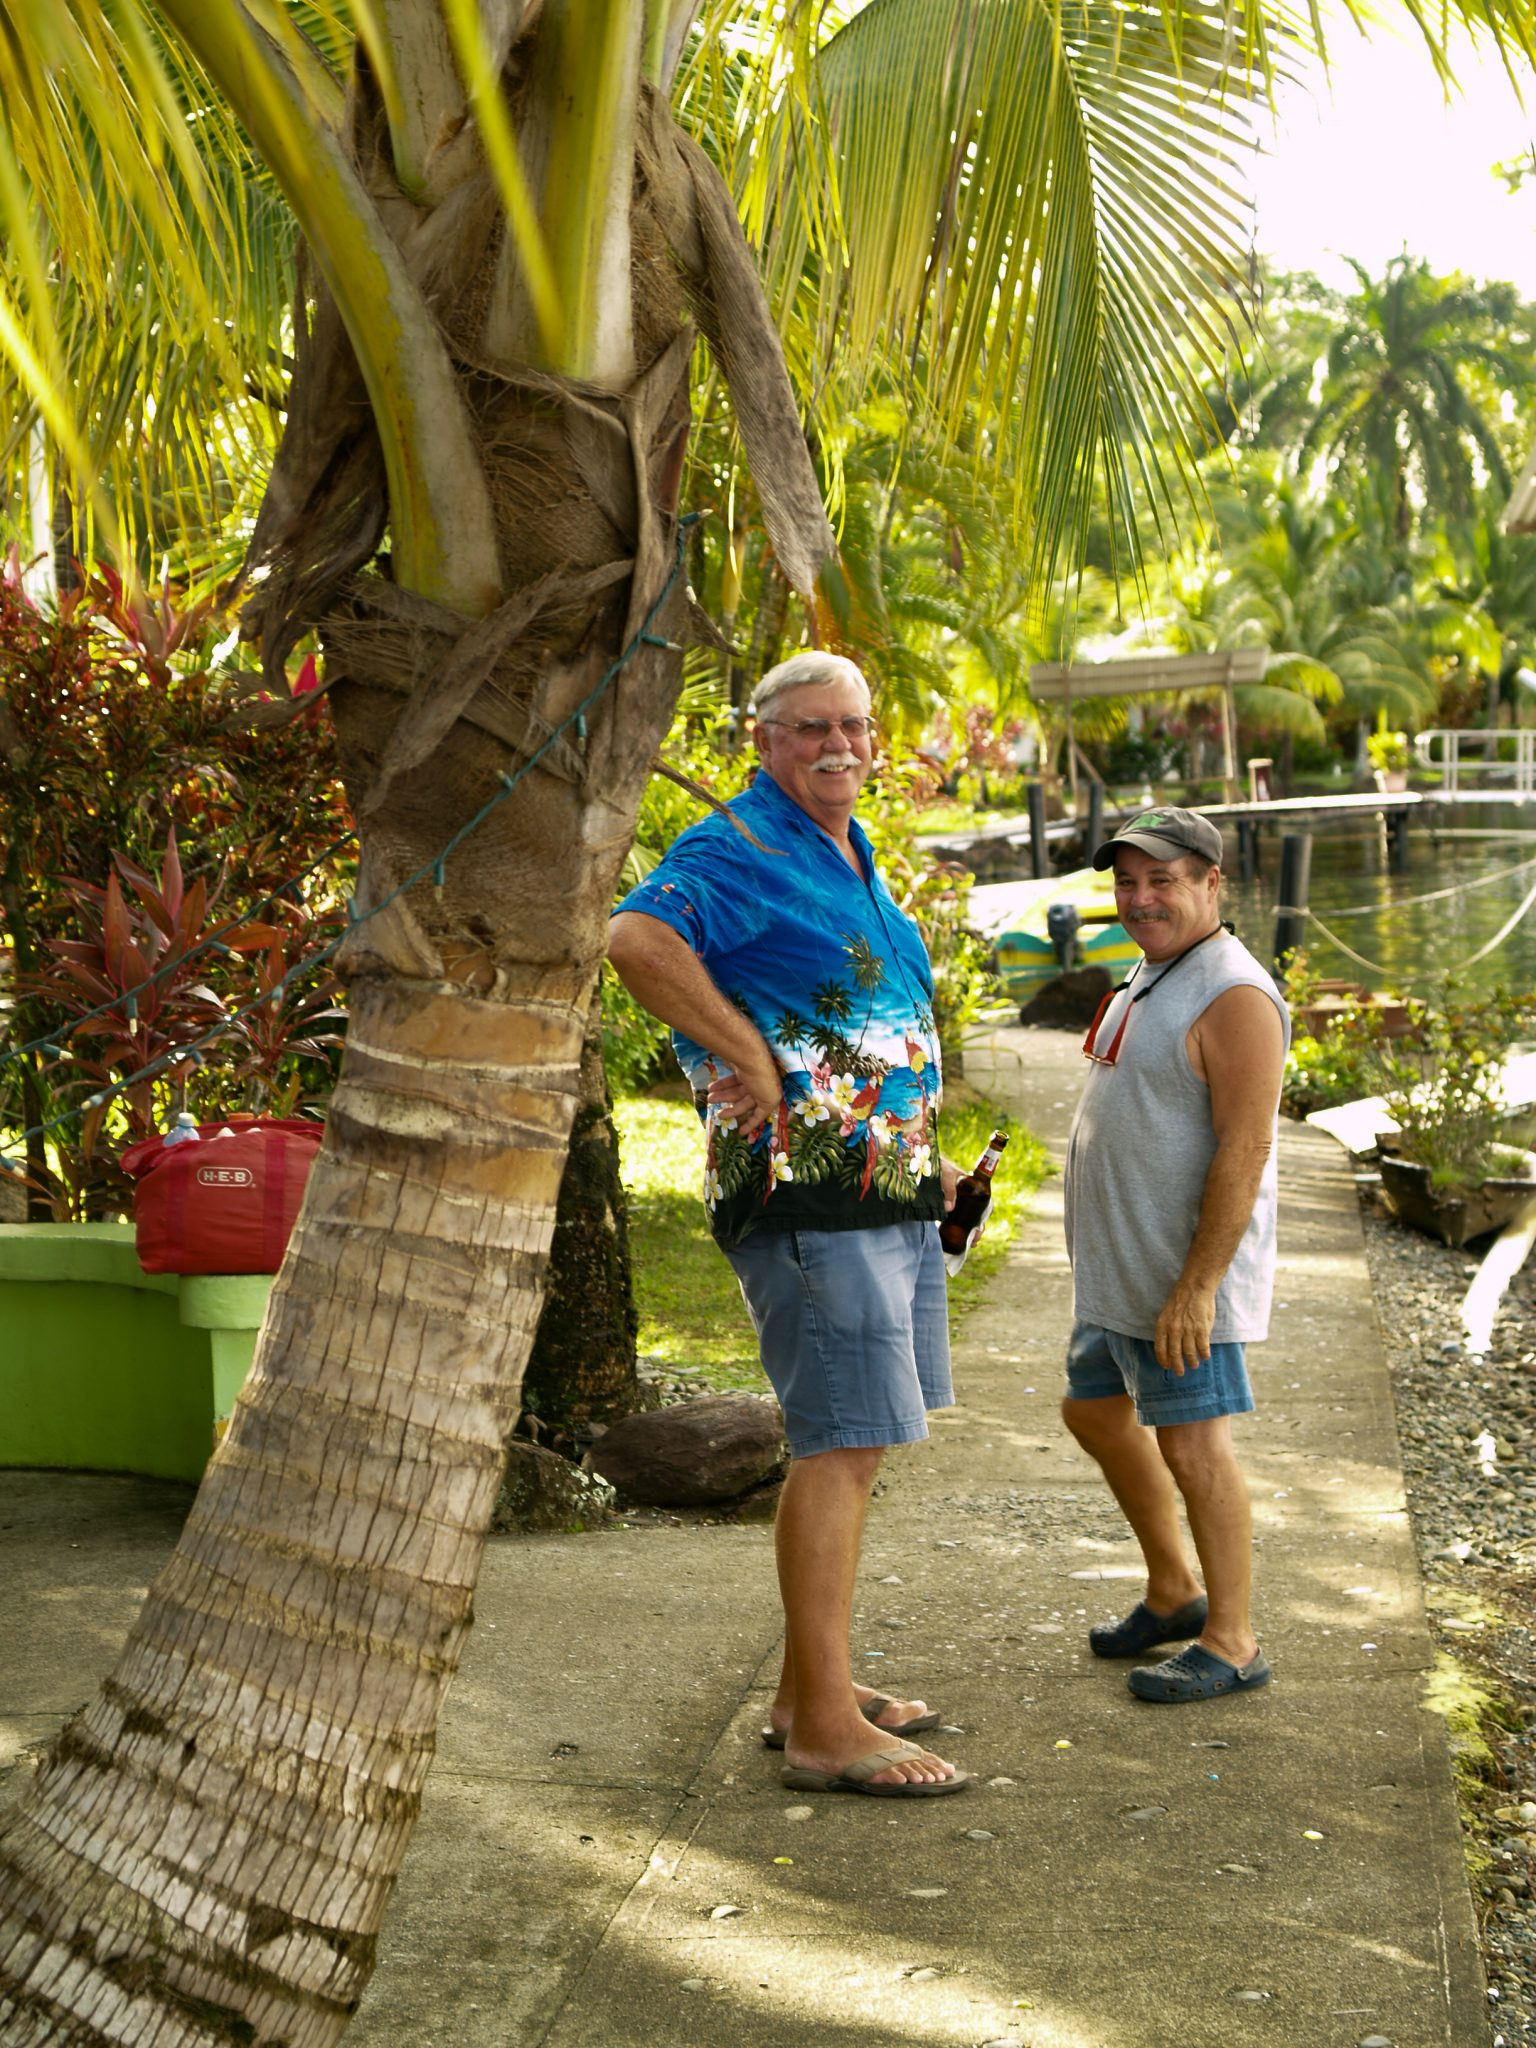 Jeff Dickinson and Peter at the Bocas Marina in Bocas del Toro Panama